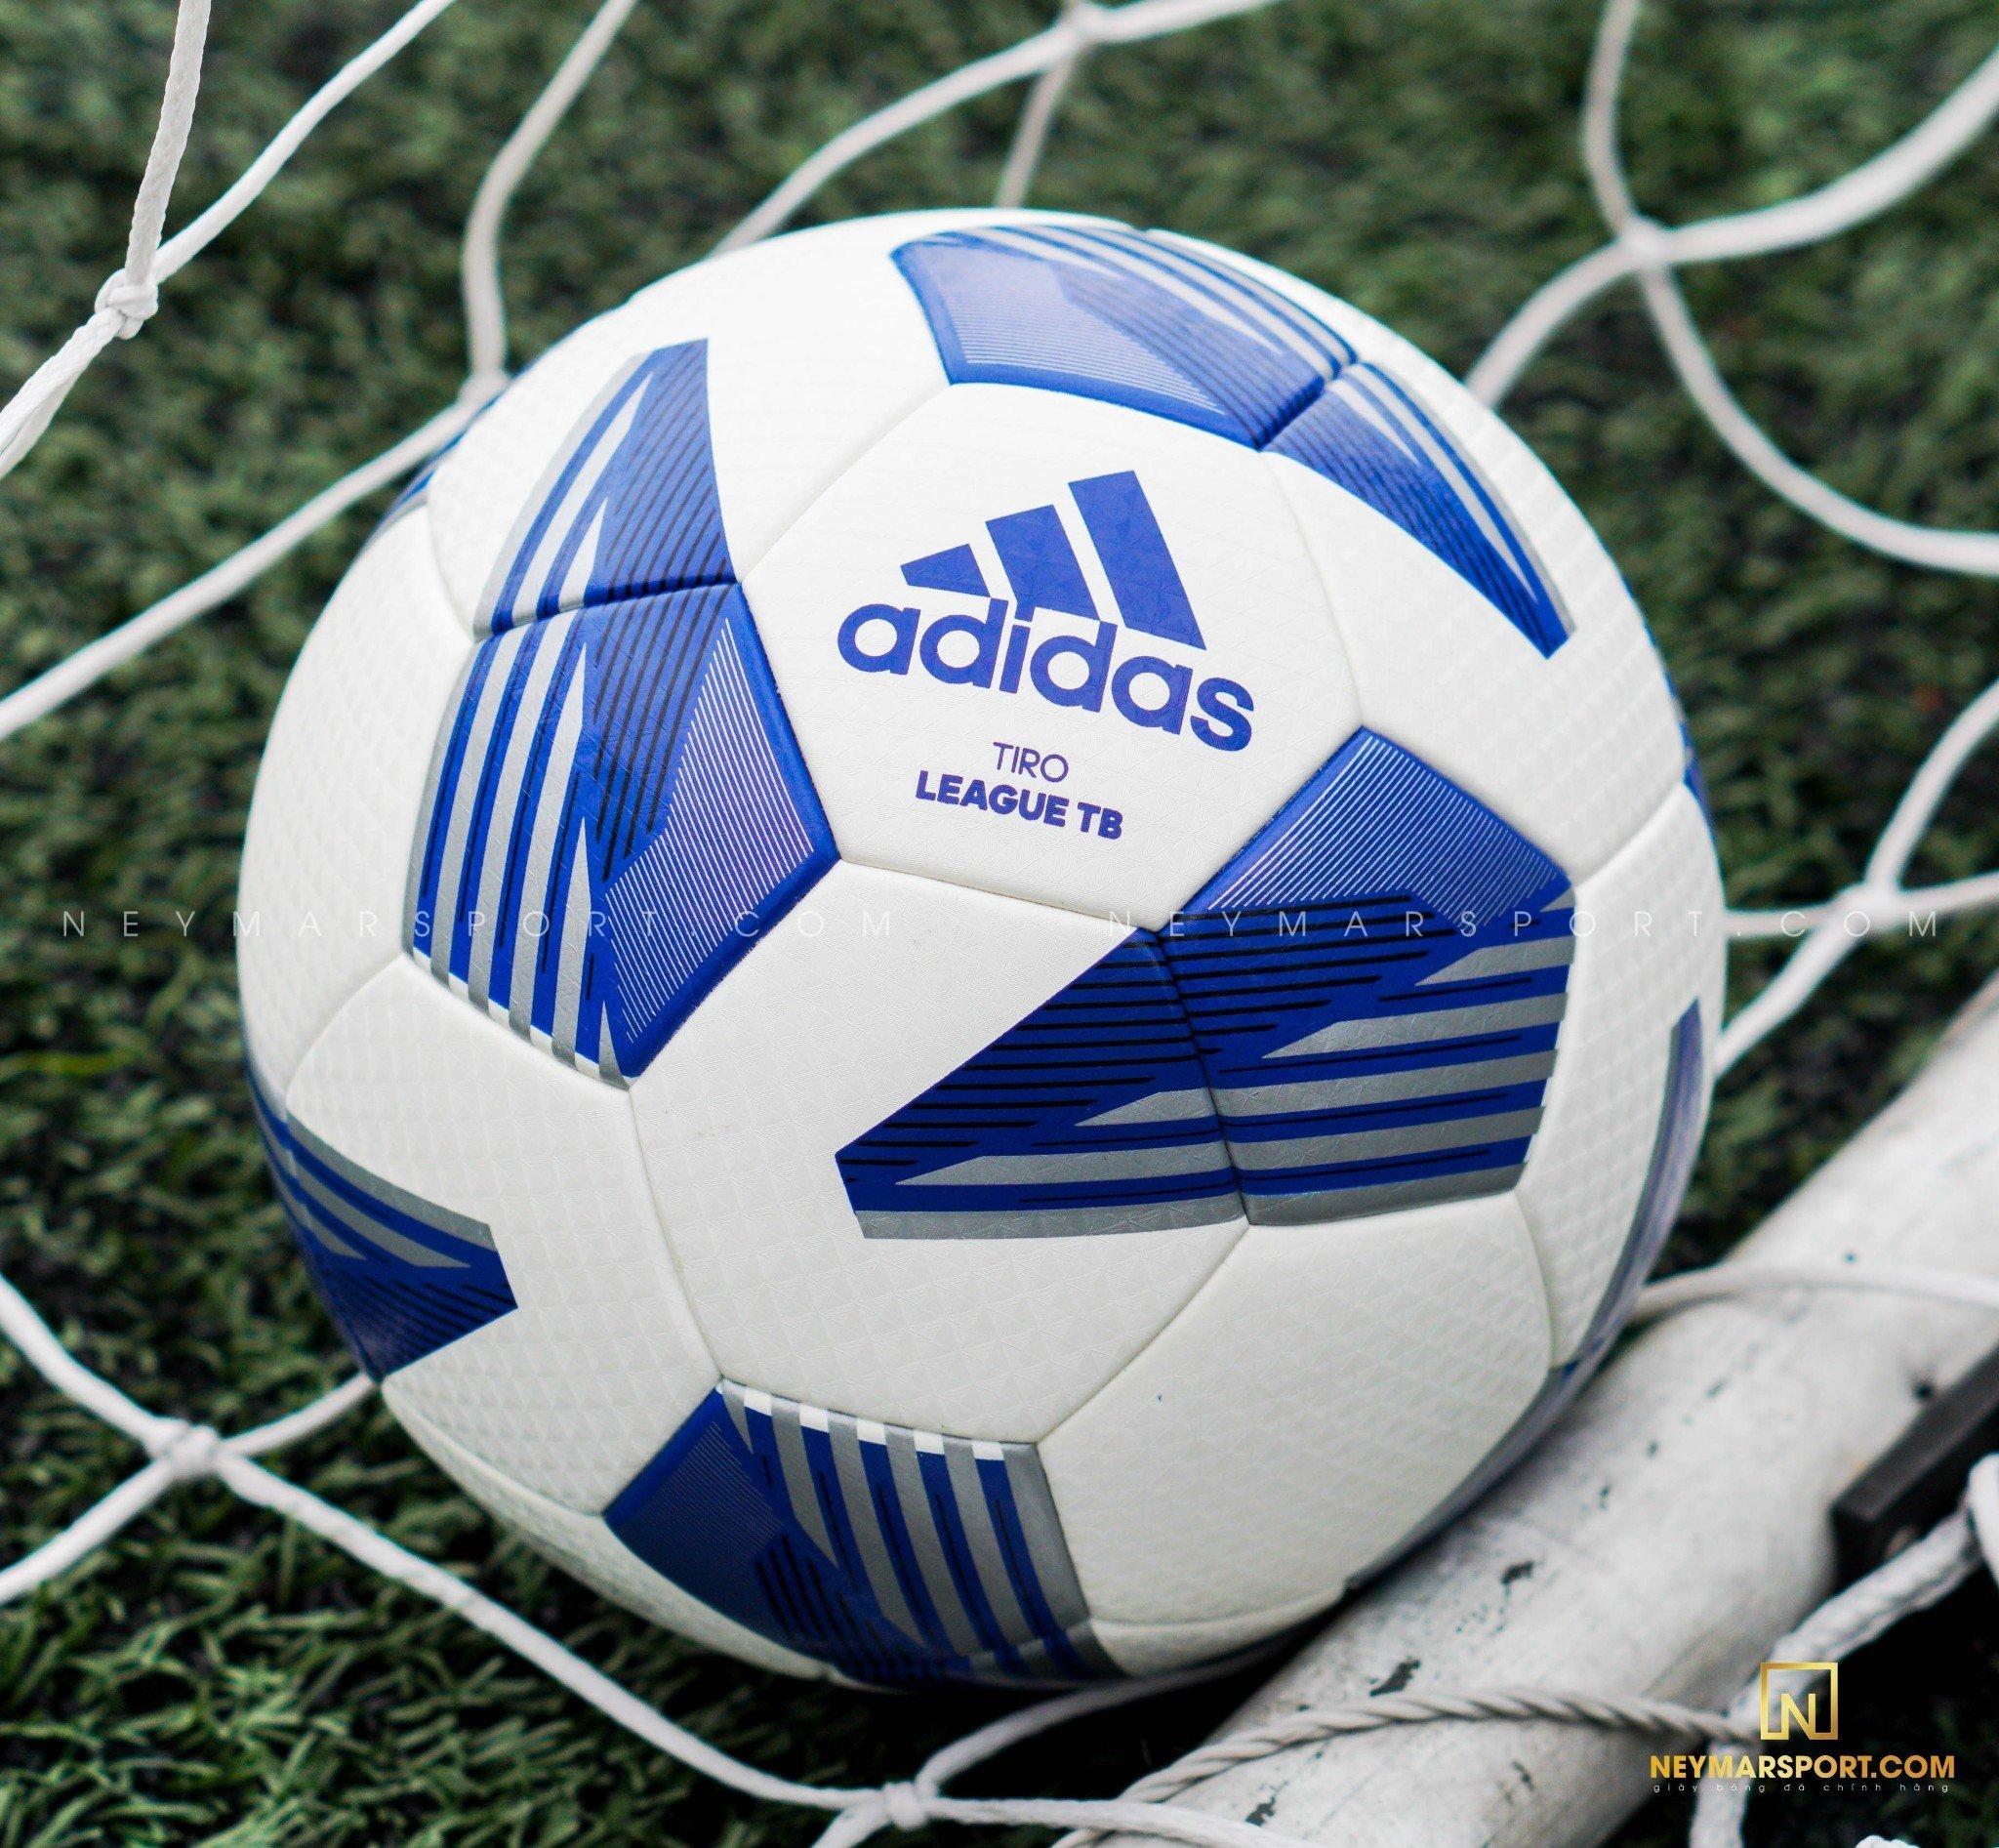 Bóng đá adidas TIRO LEAGUE TB- WHITE/ BLUE